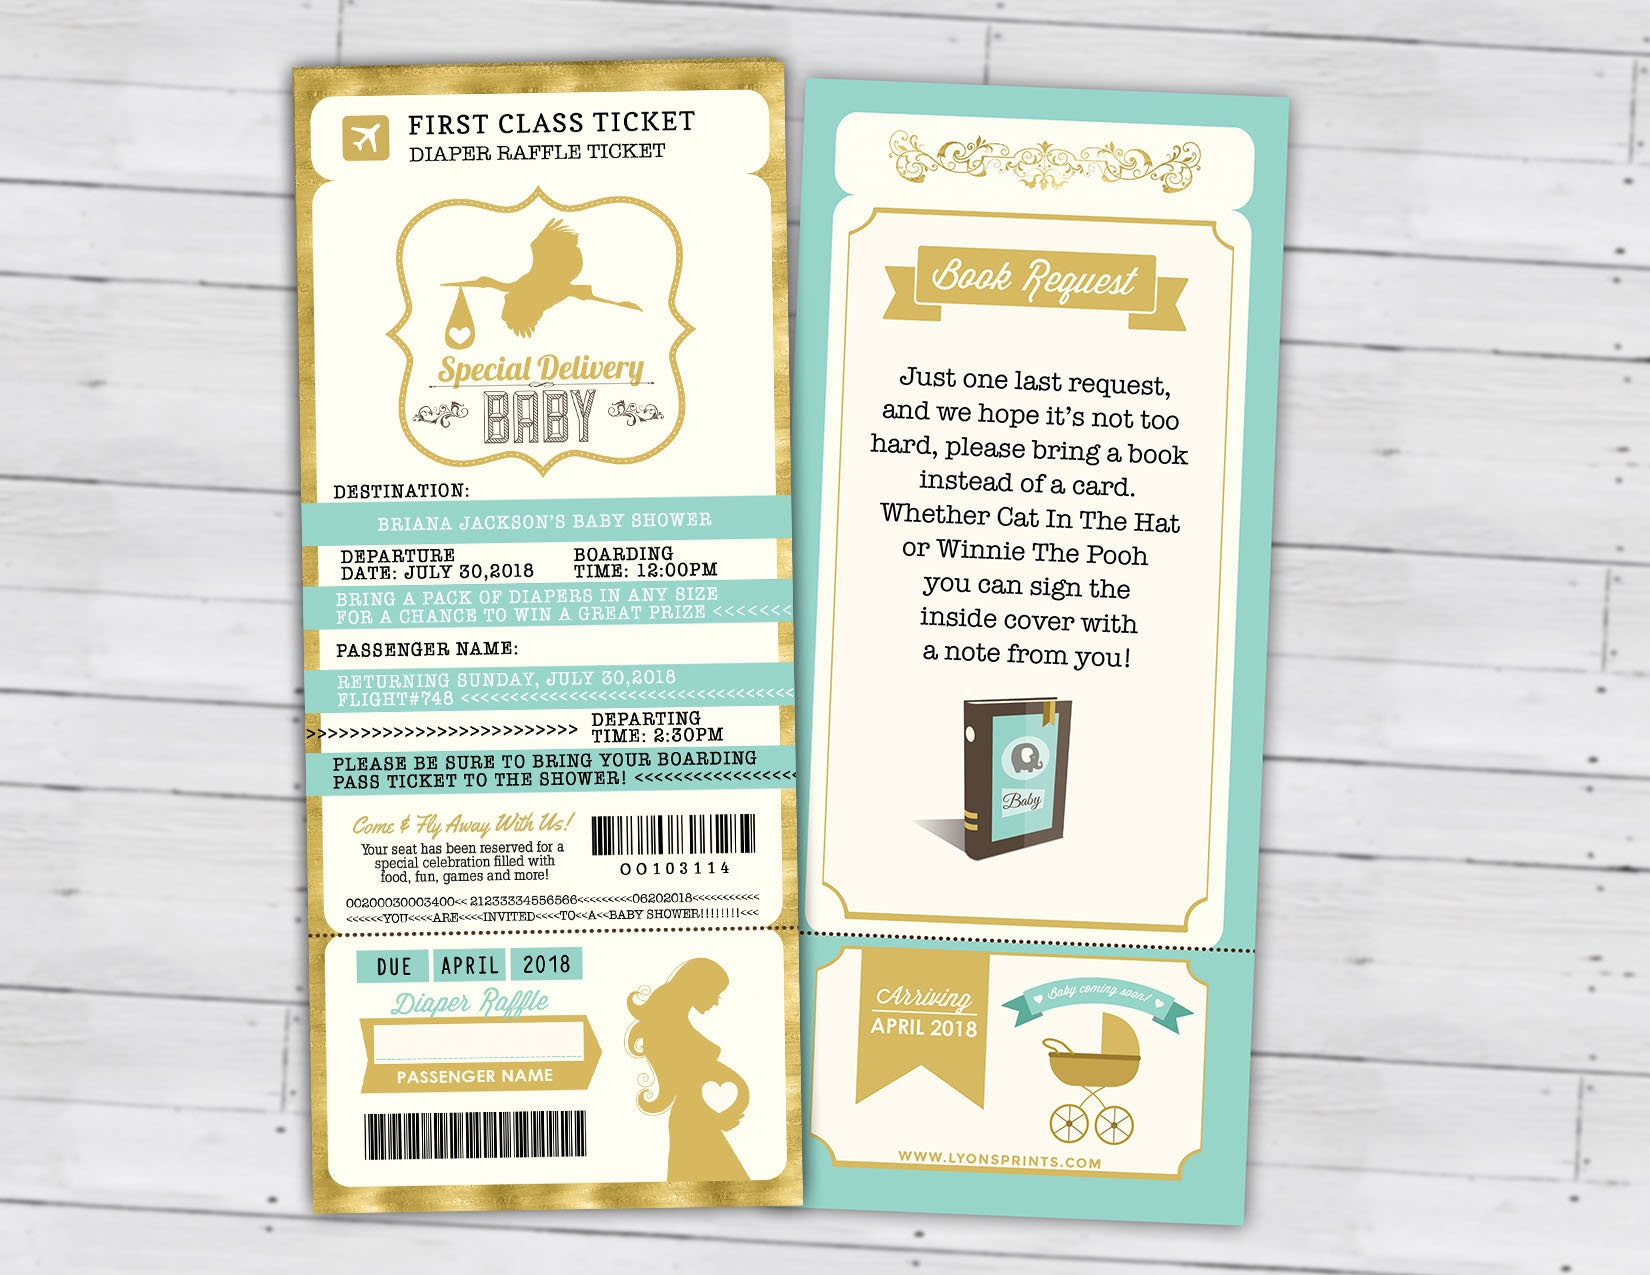 Diaper raffle passport and ticket baby shower invitation coed baby diaper raffle passport and ticket baby shower invitation coed baby shower invitation travel baby shower invitation couples baby shower filmwisefo